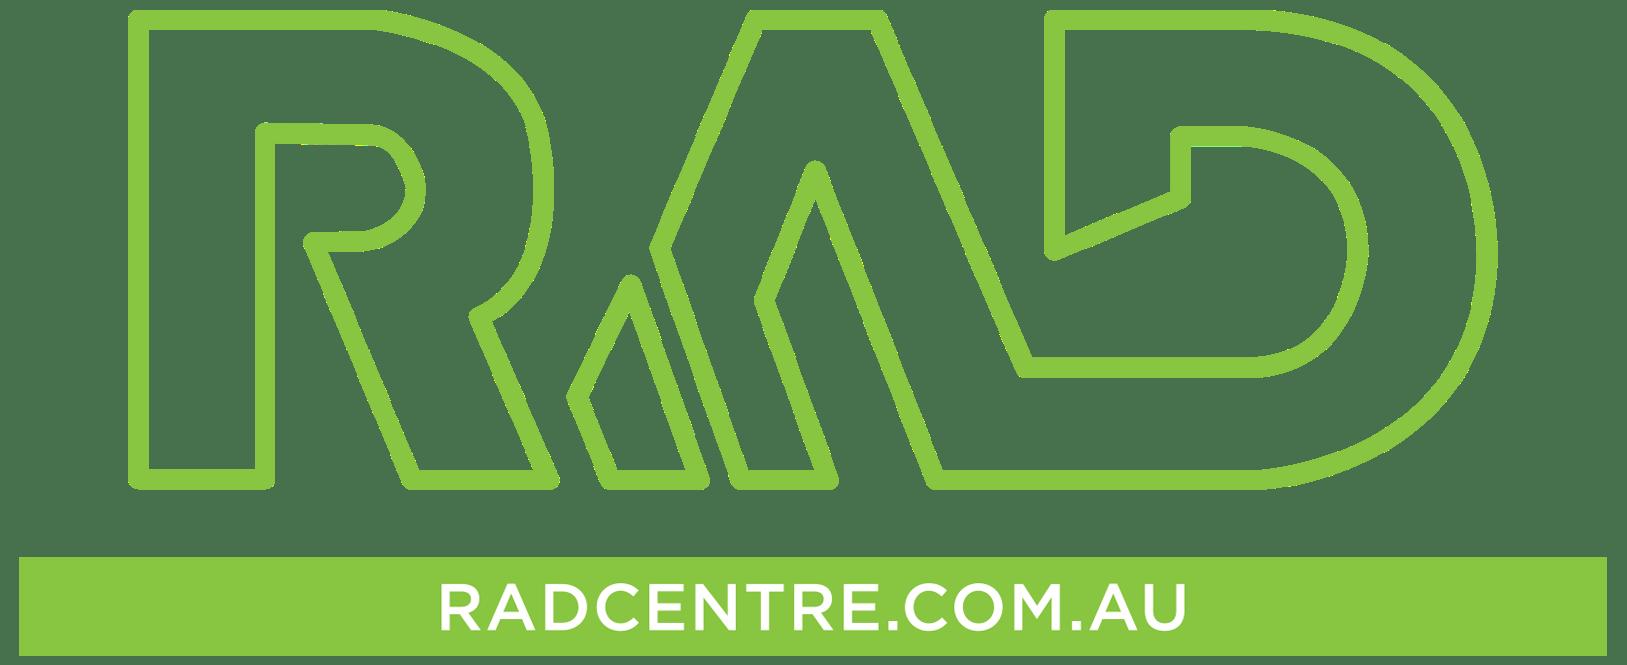 RAD2_logo_